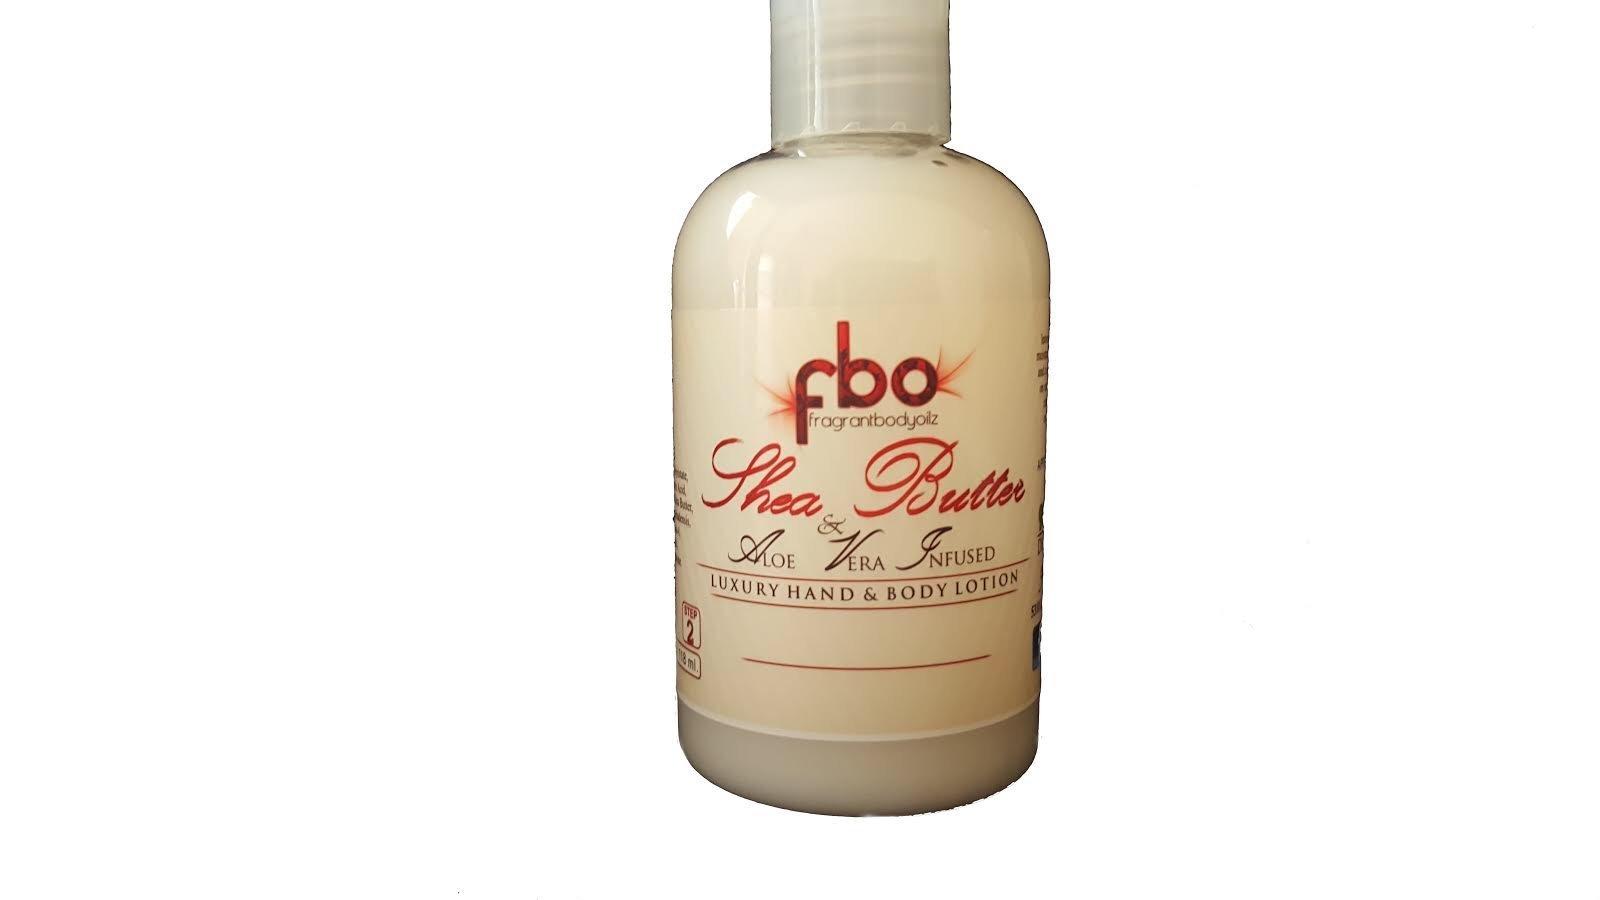 FragranceBodyOilz Impression of White Linen By Estee Lauder (4 OZ Lotion) for Women Premium Hypoallergenic Perfume Body Lotion, Affordable Generic Version